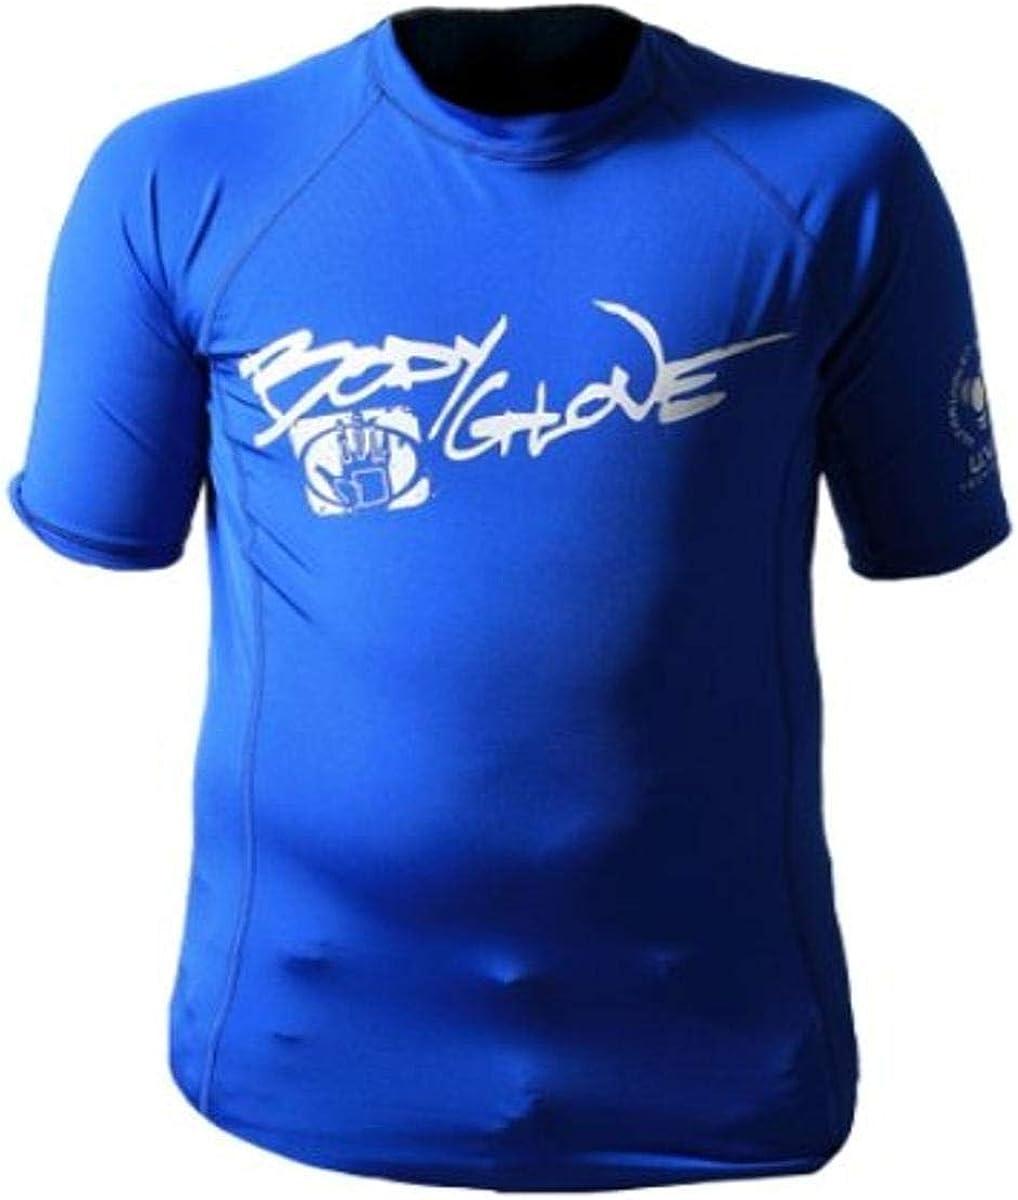 Body Glove Basic Deluxe Junior's Short Sleeve Lycra Rashguard Shirt